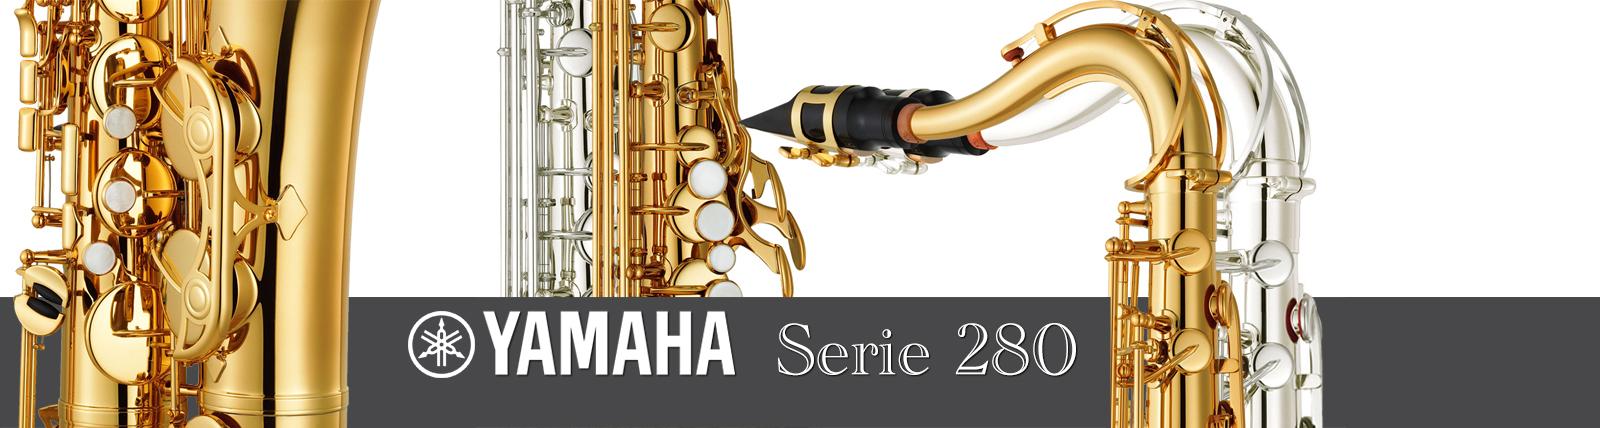 saxofones yamaha serie 280